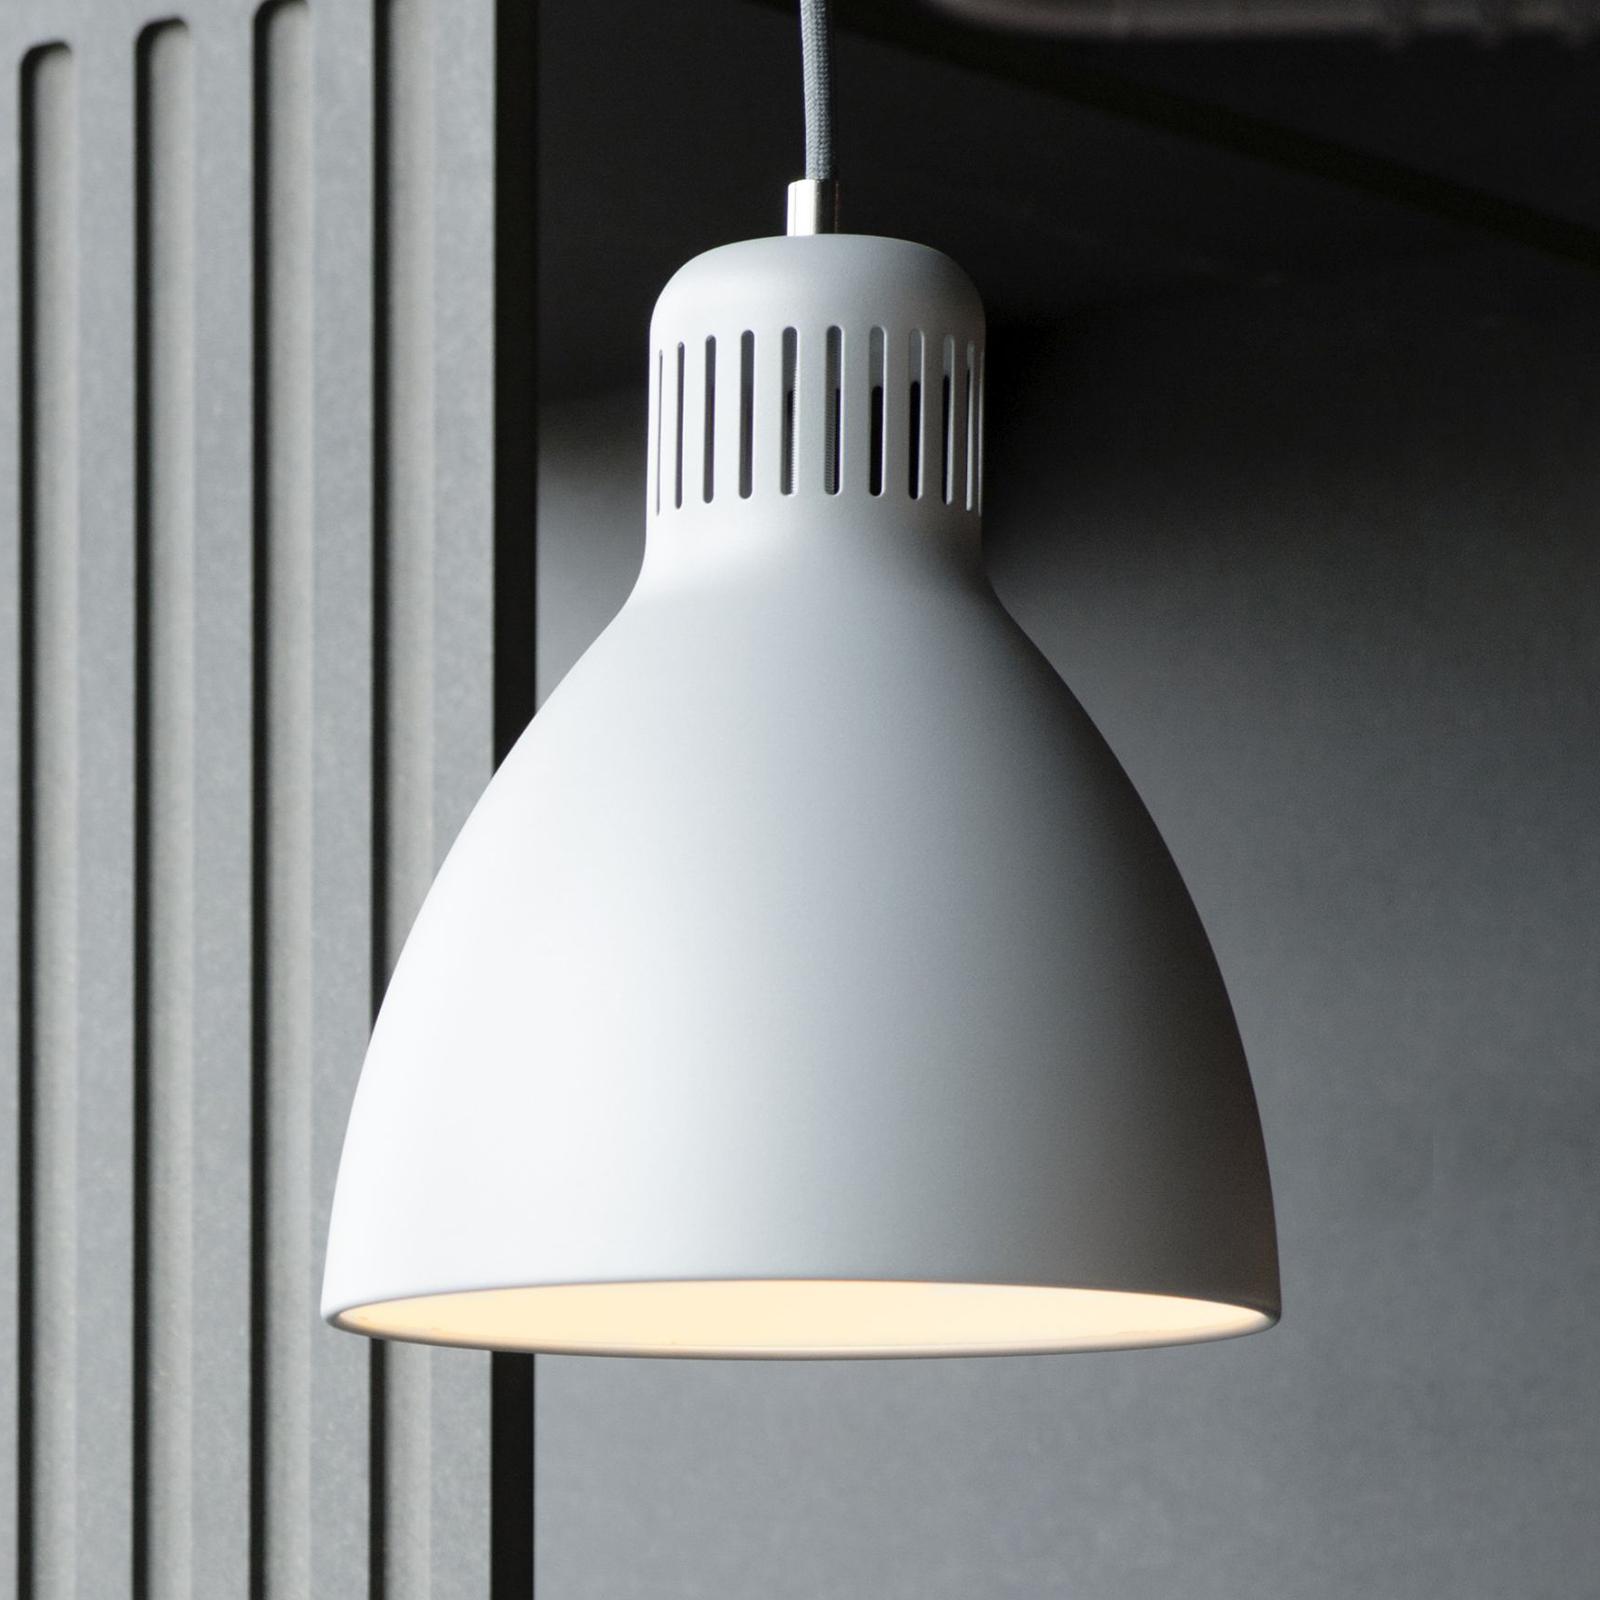 Suspension LED L-1 dimmable DALI, 4000K, blanche